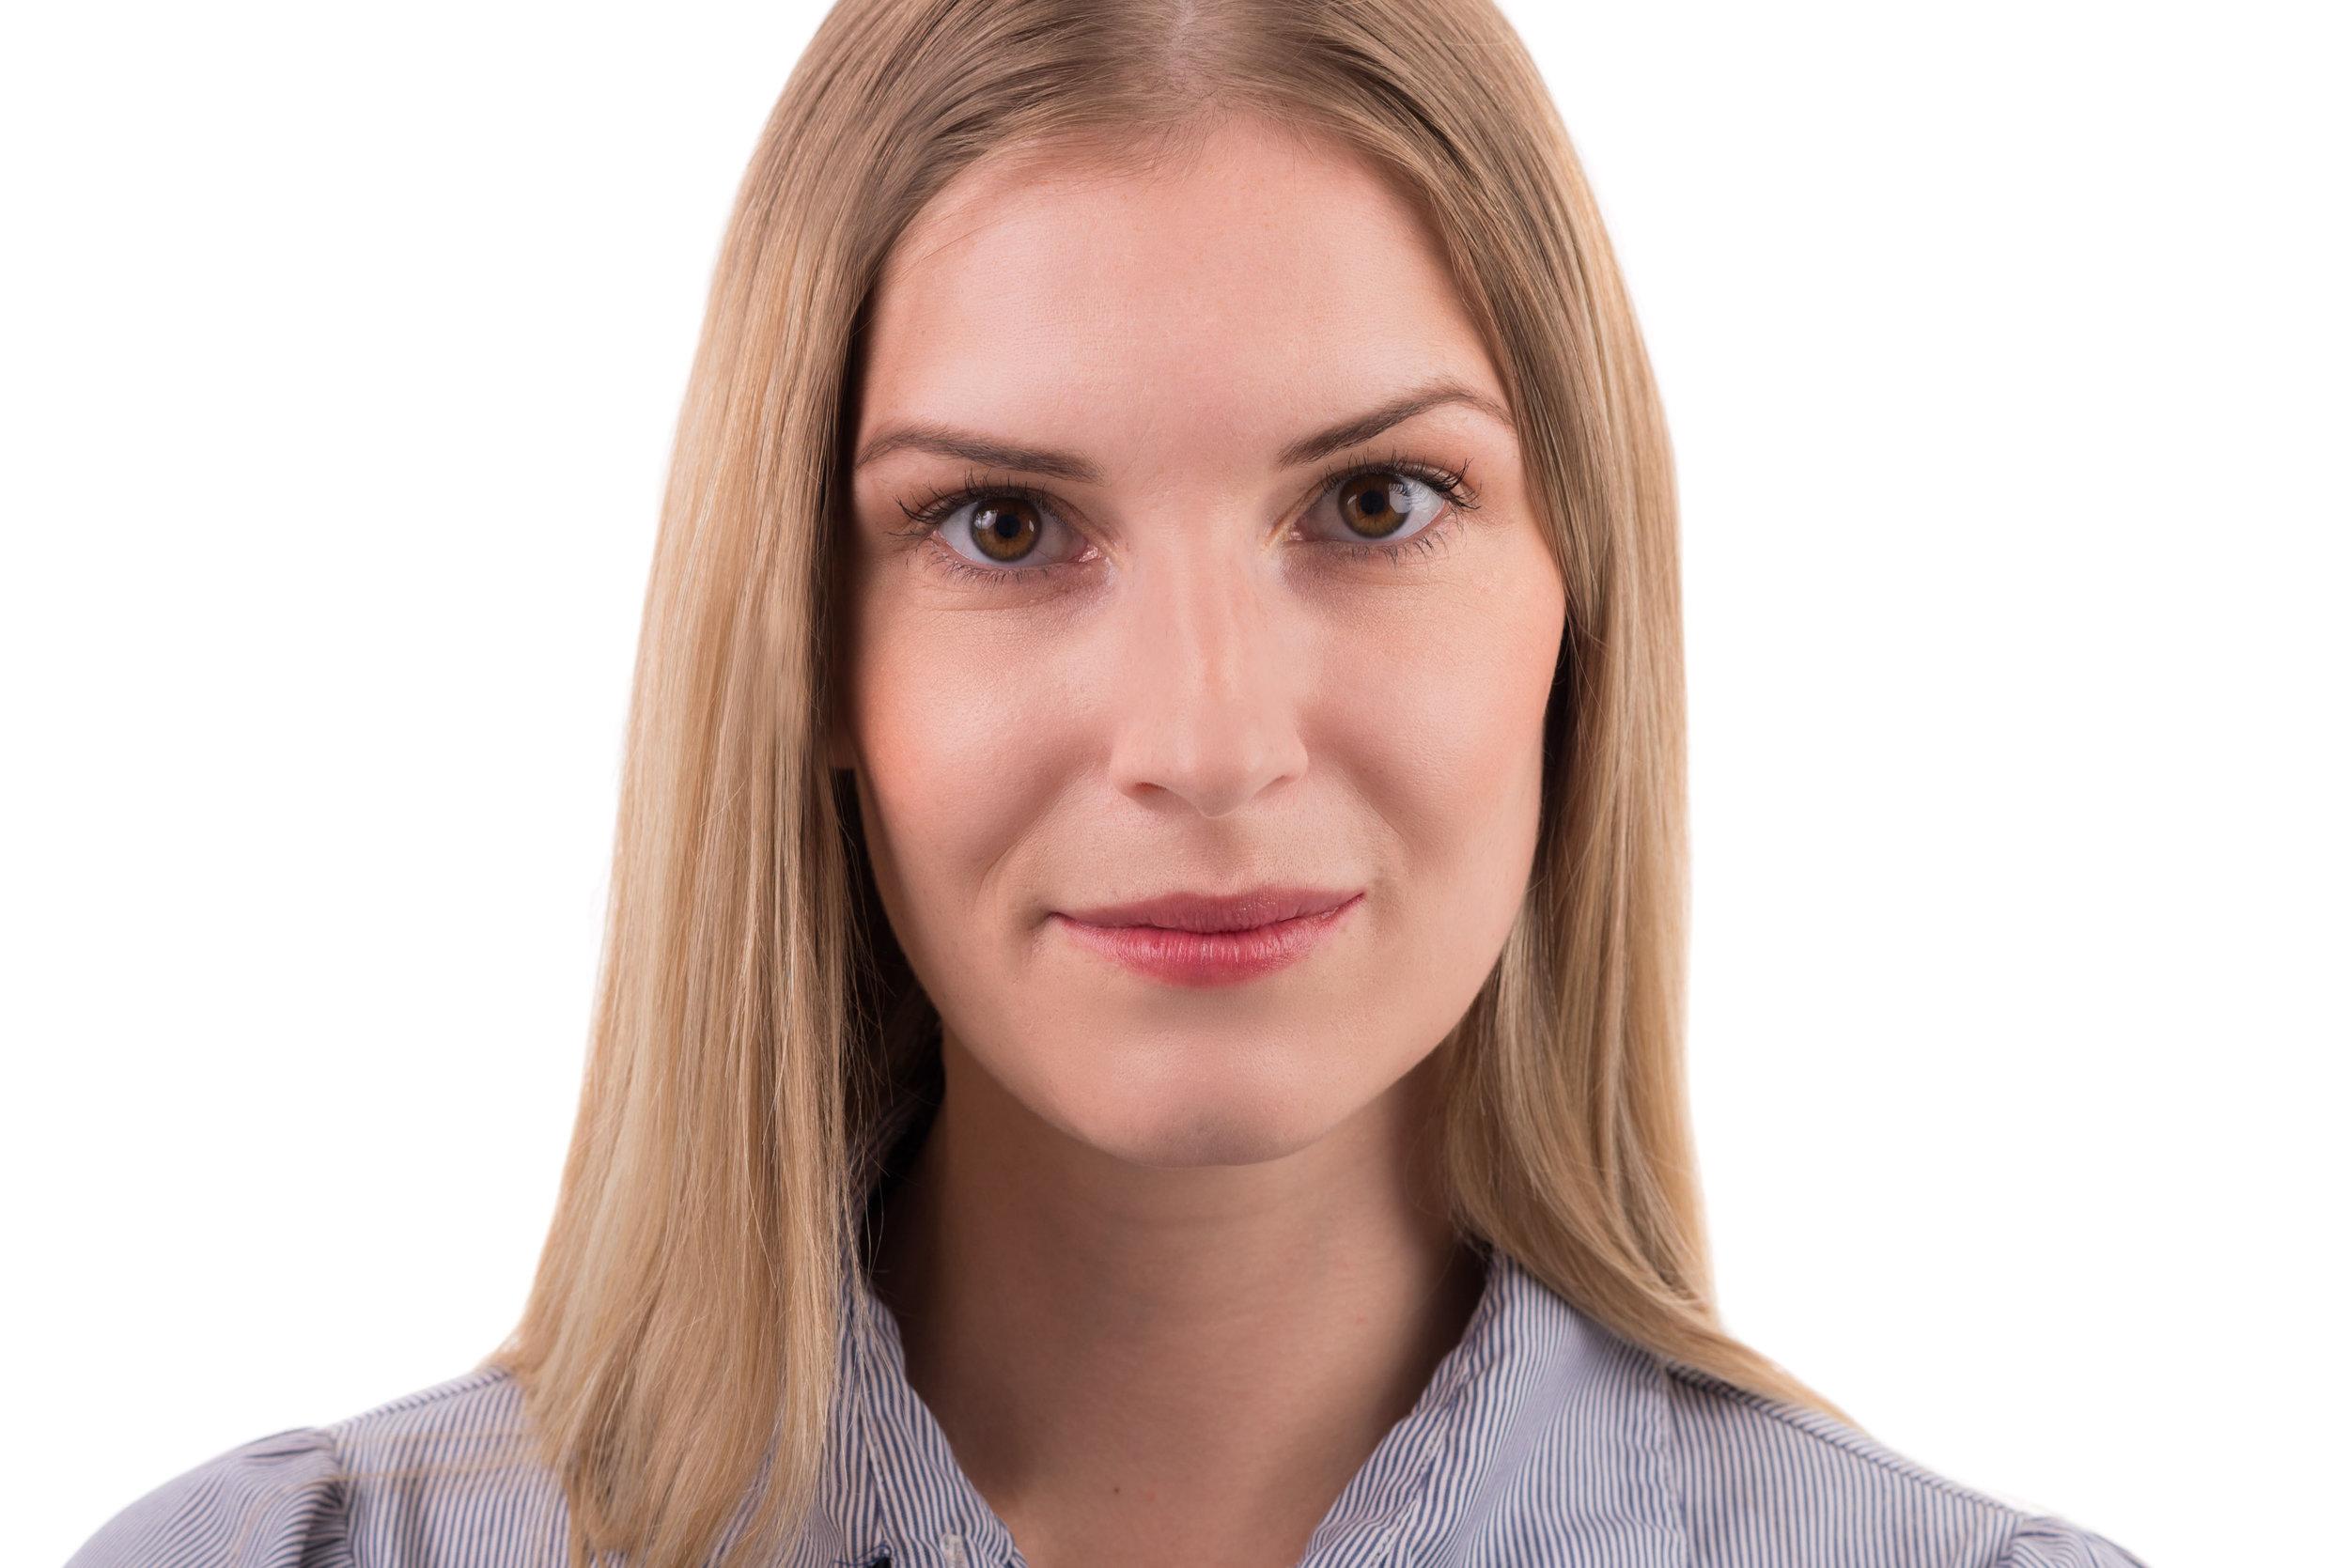 Blonde Businesswoman Headshot Photo Wearing Light Shirt